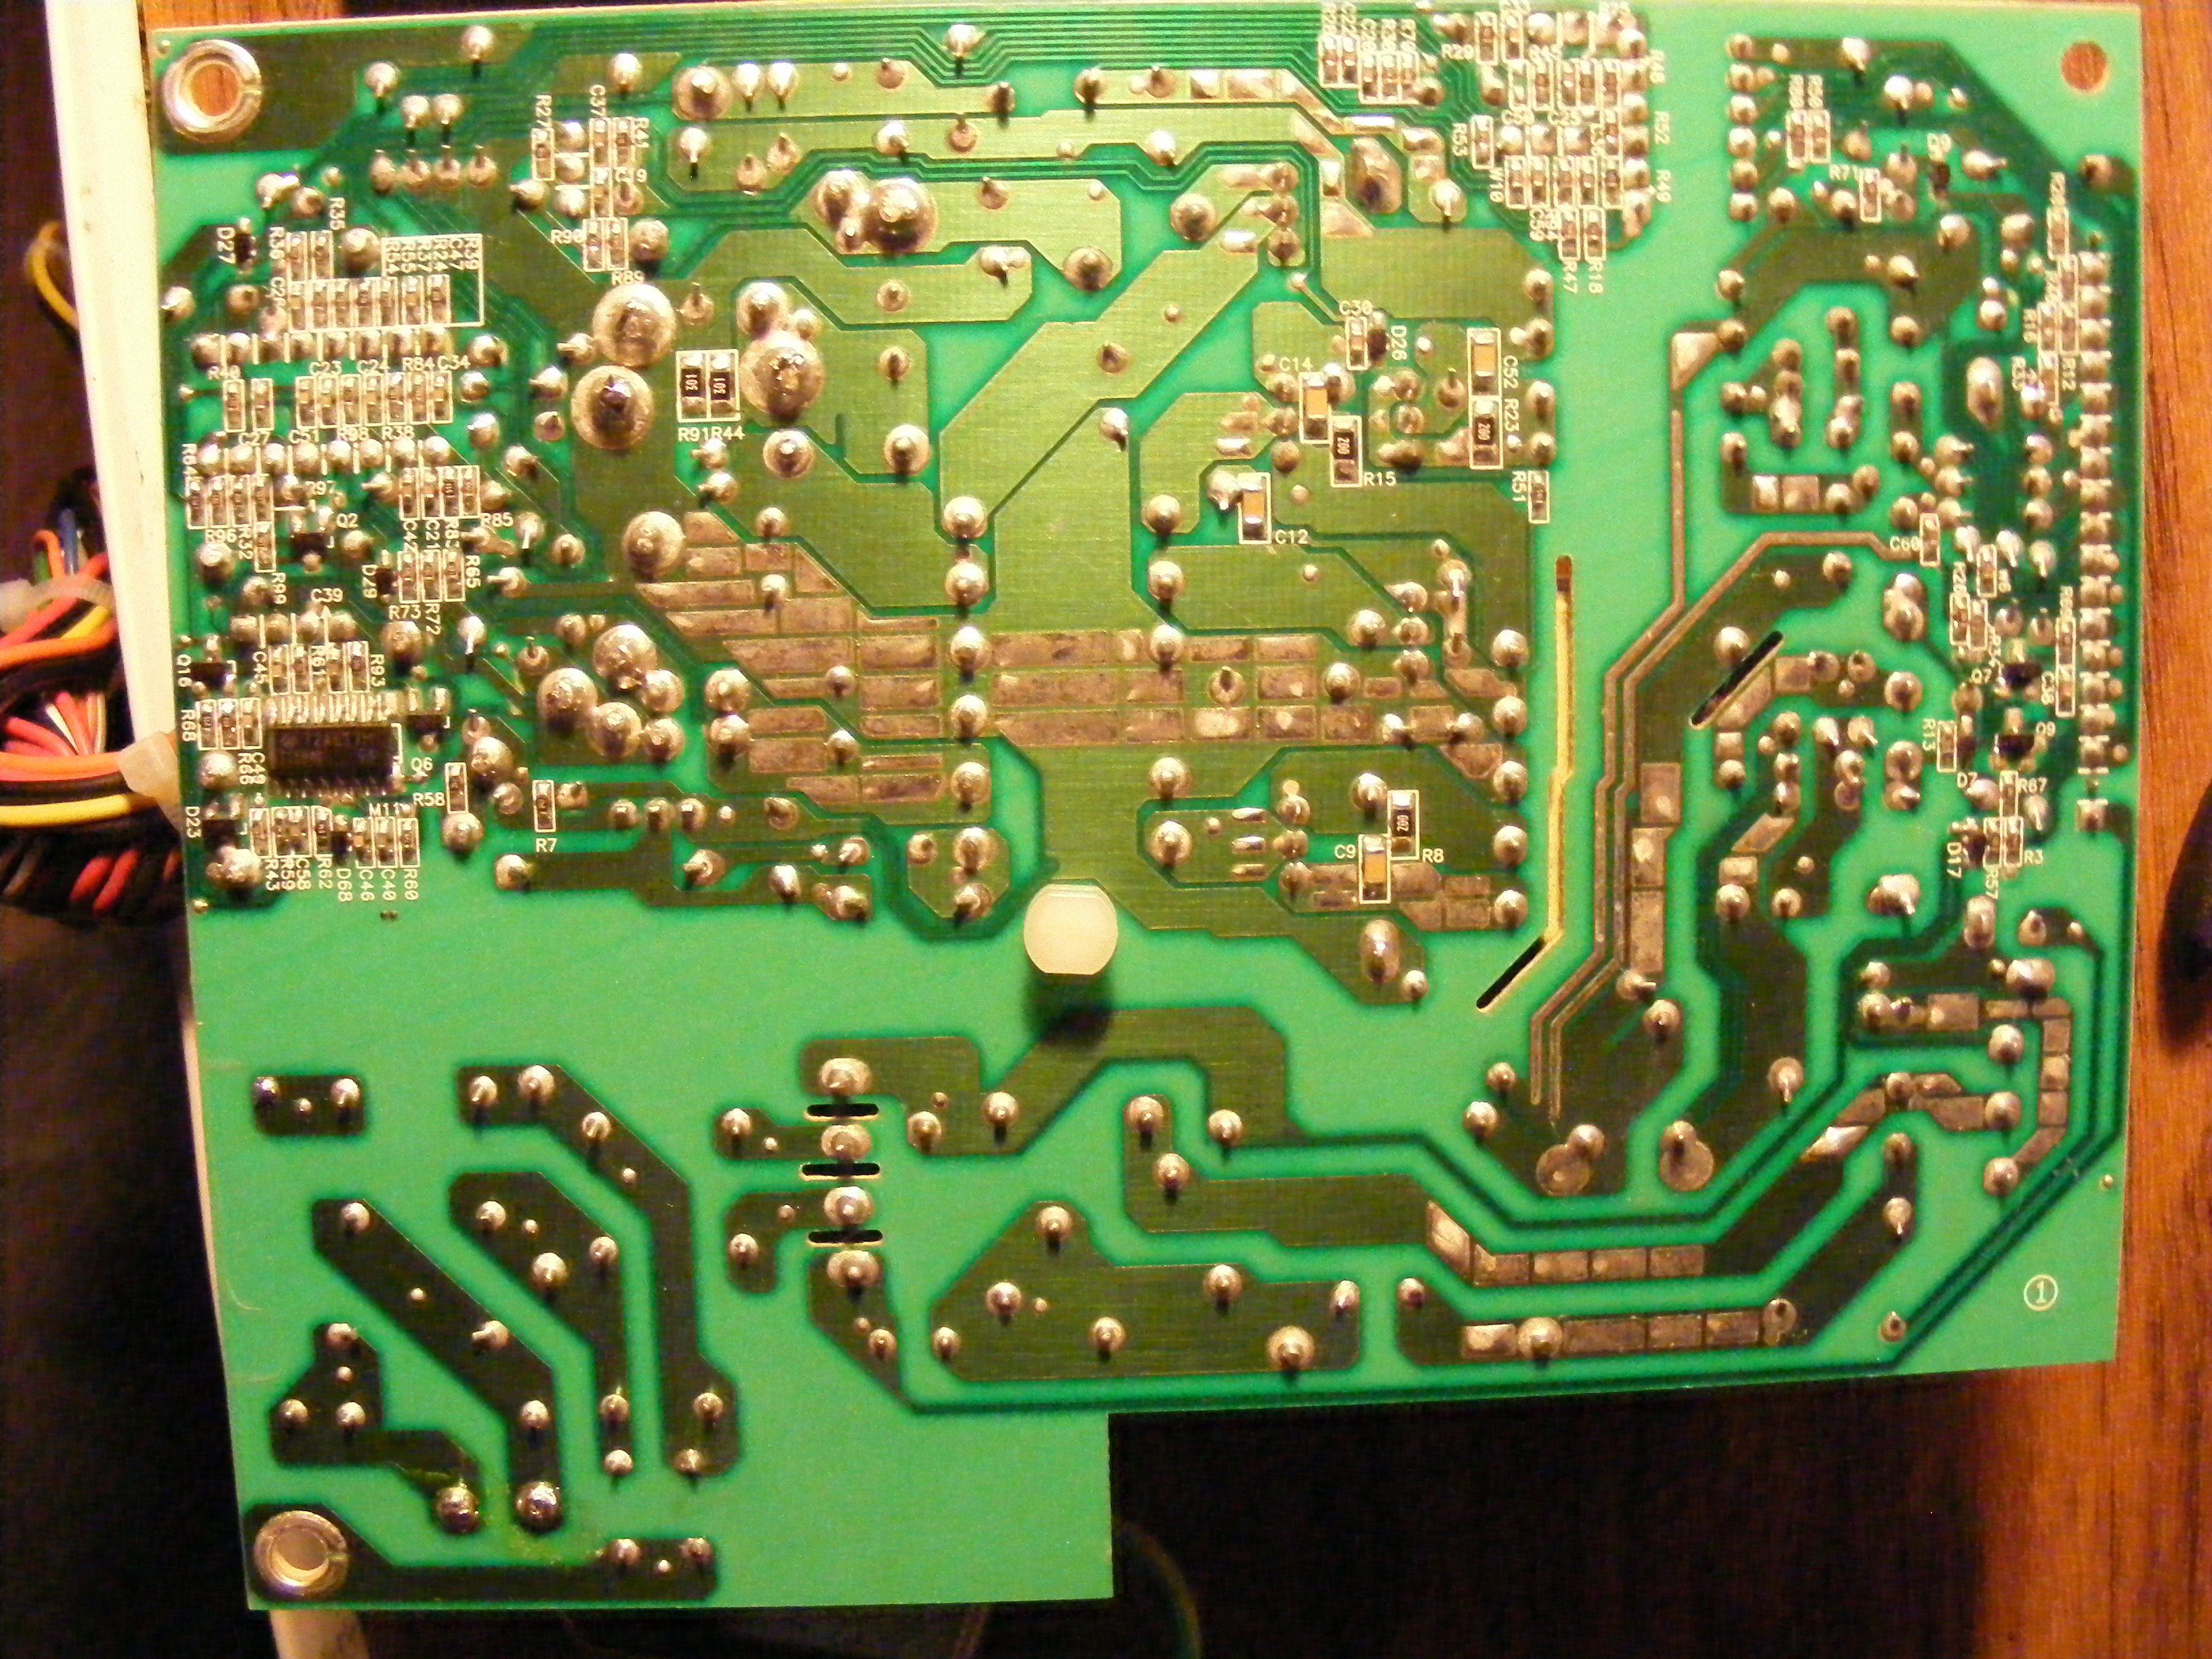 PC Power Supply Repair